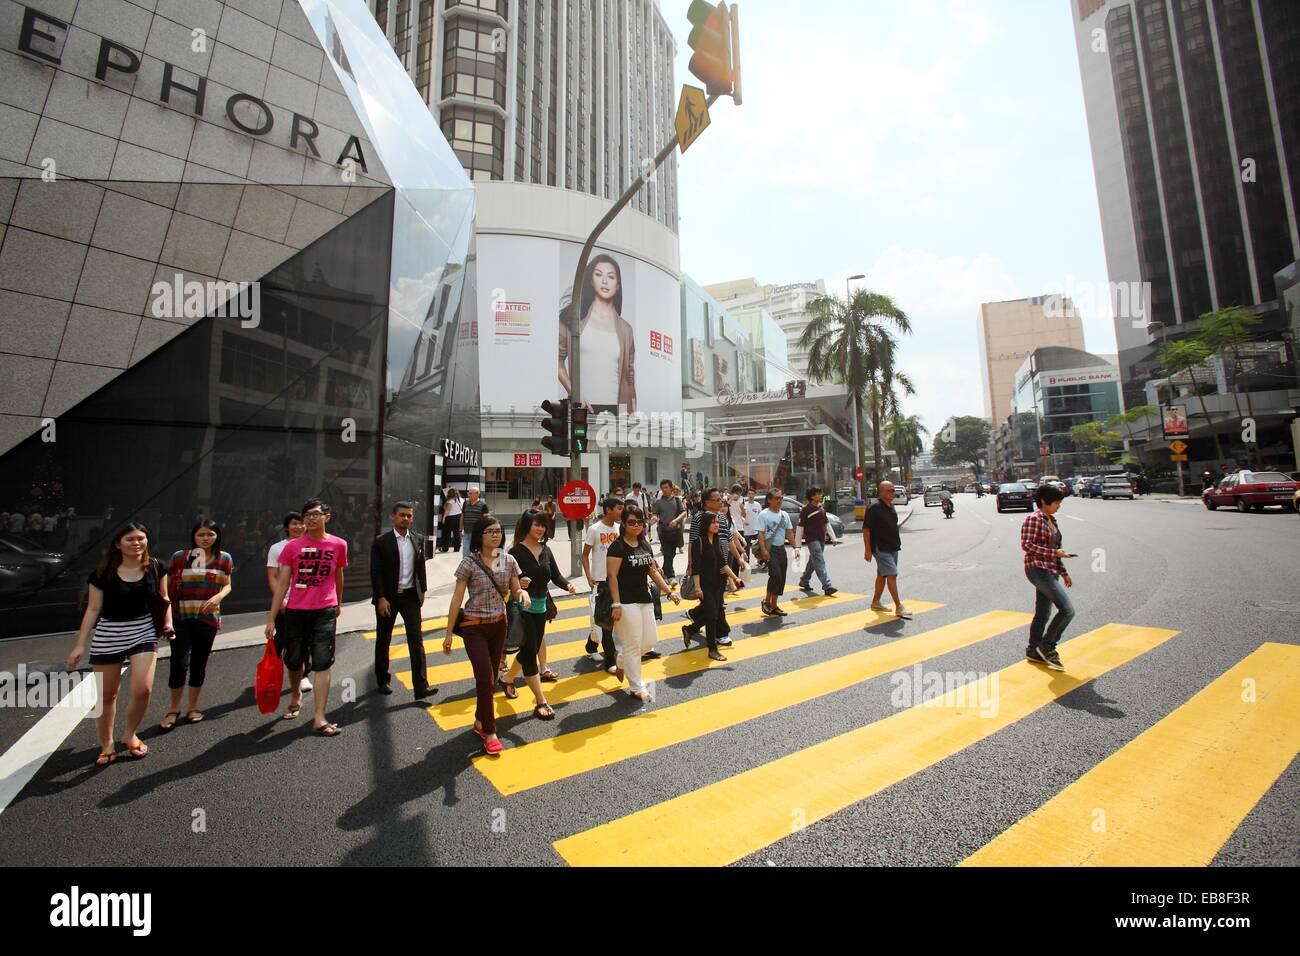 Zebra Crossing And The Modern Architecture In Kuala Lumpur Malaysia Stock Photo Alamy